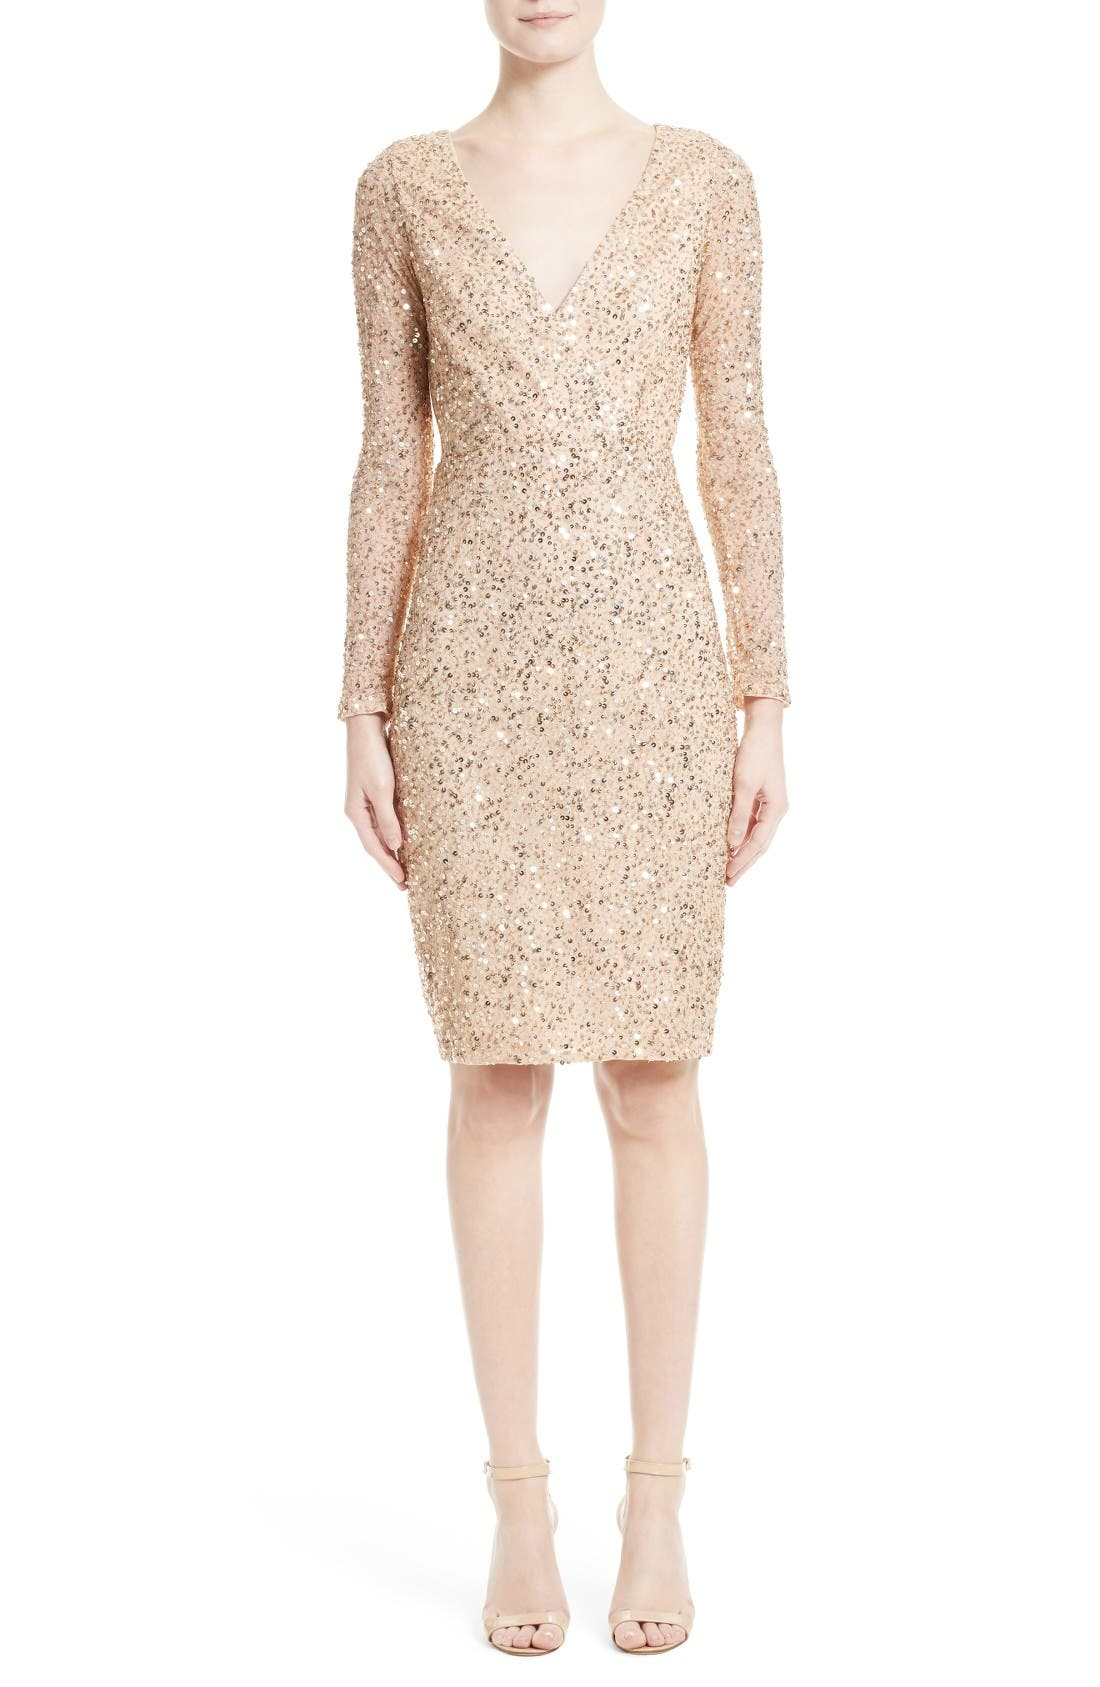 RACHEL GILBERT Sequin Body-Con Dress